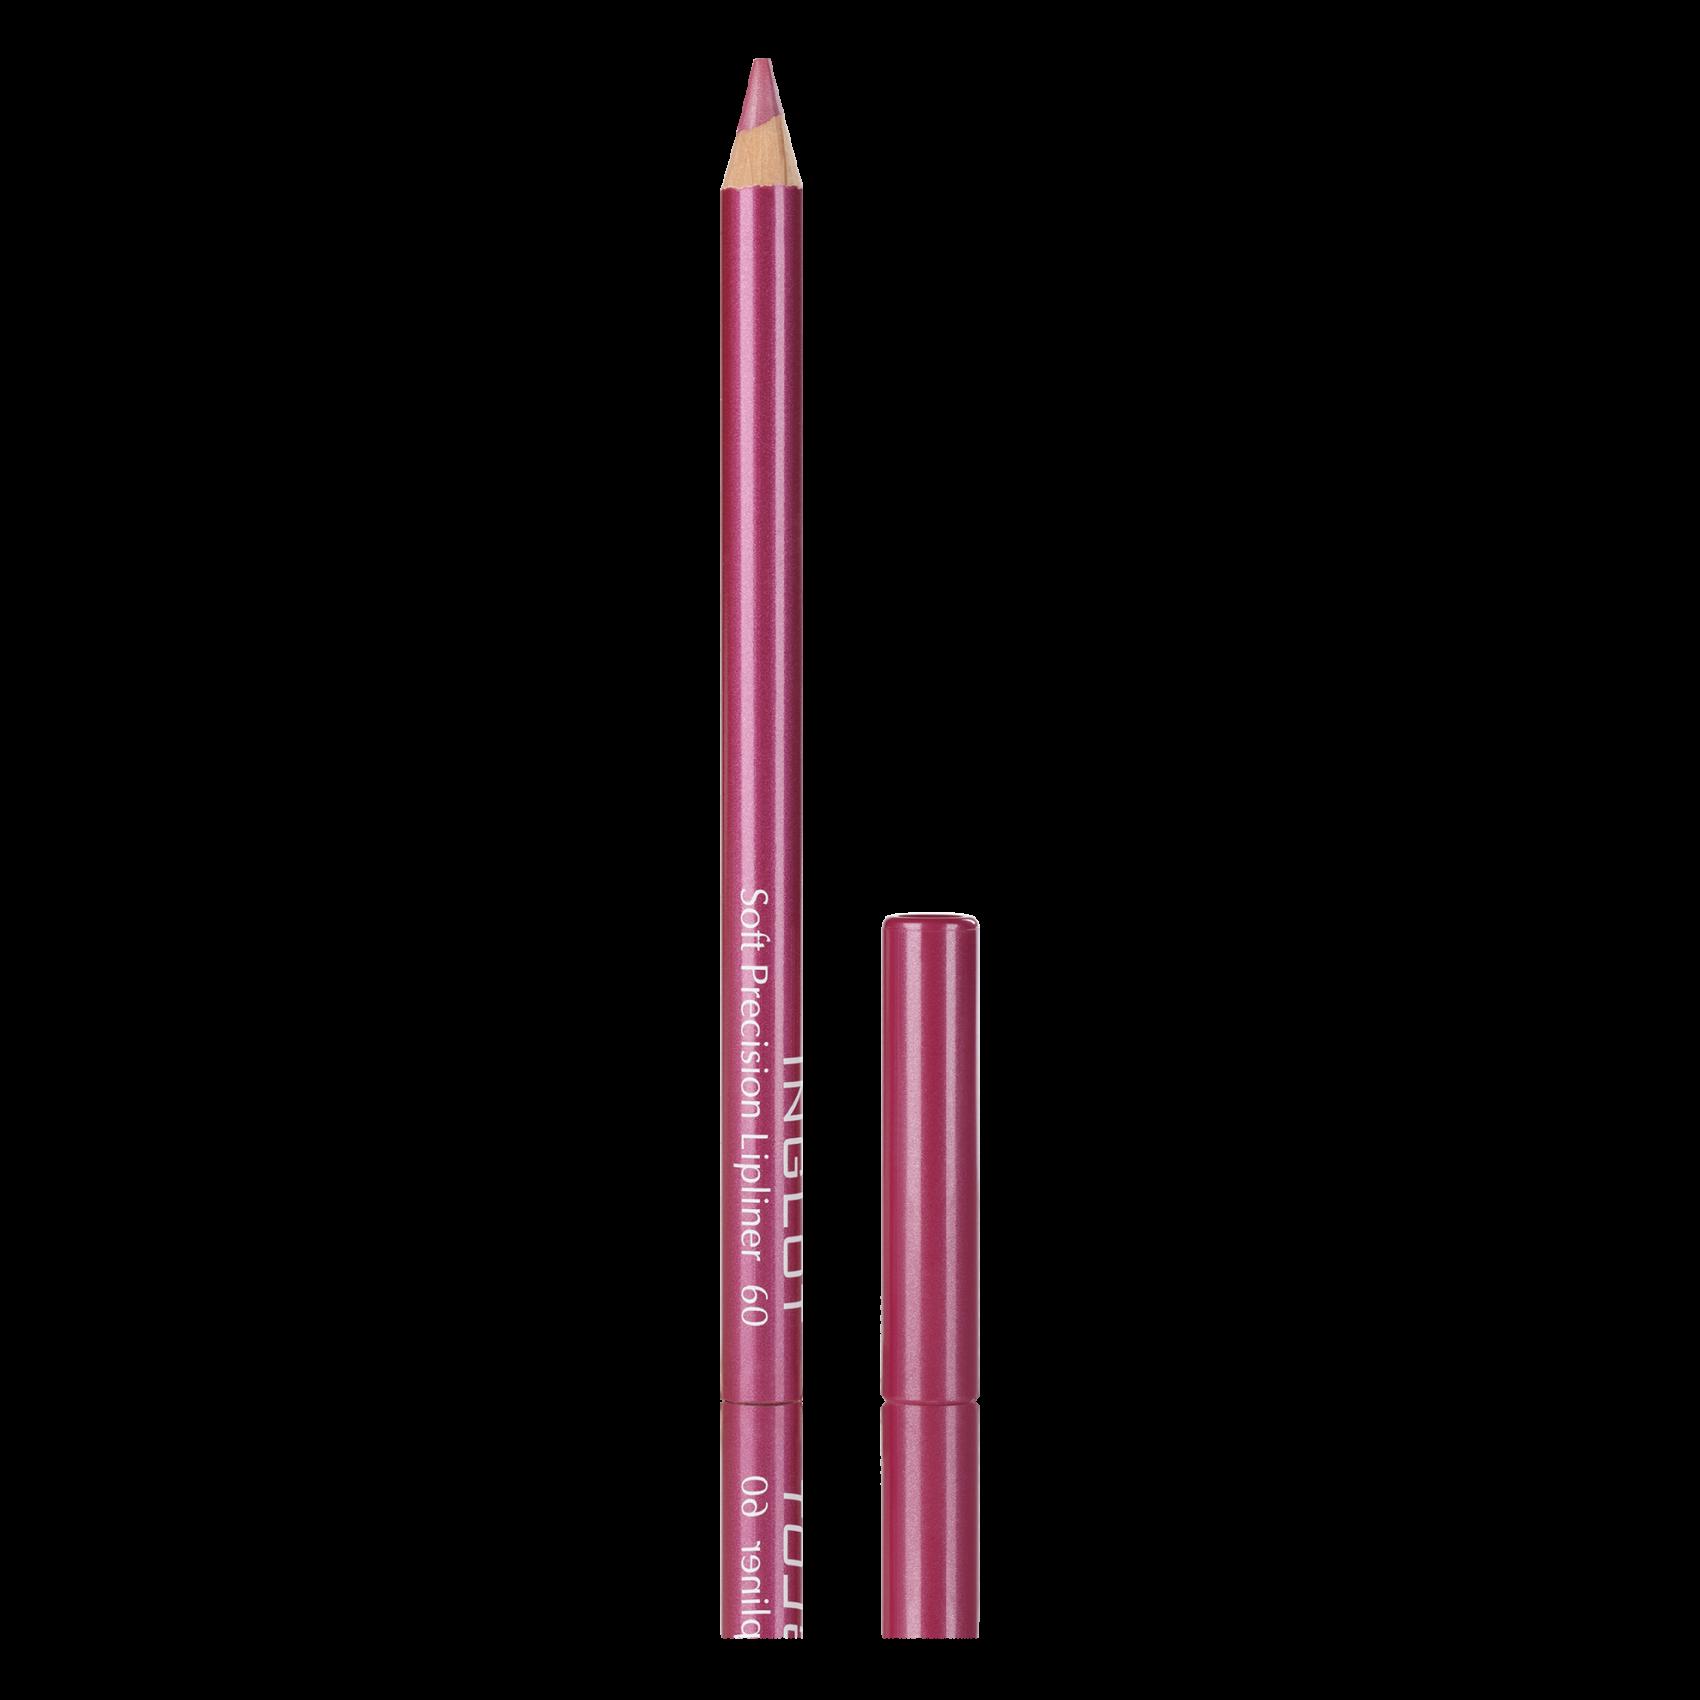 Контурный карандаш  для губ / Контурный карандаш  для губ (LIPLINER 60)